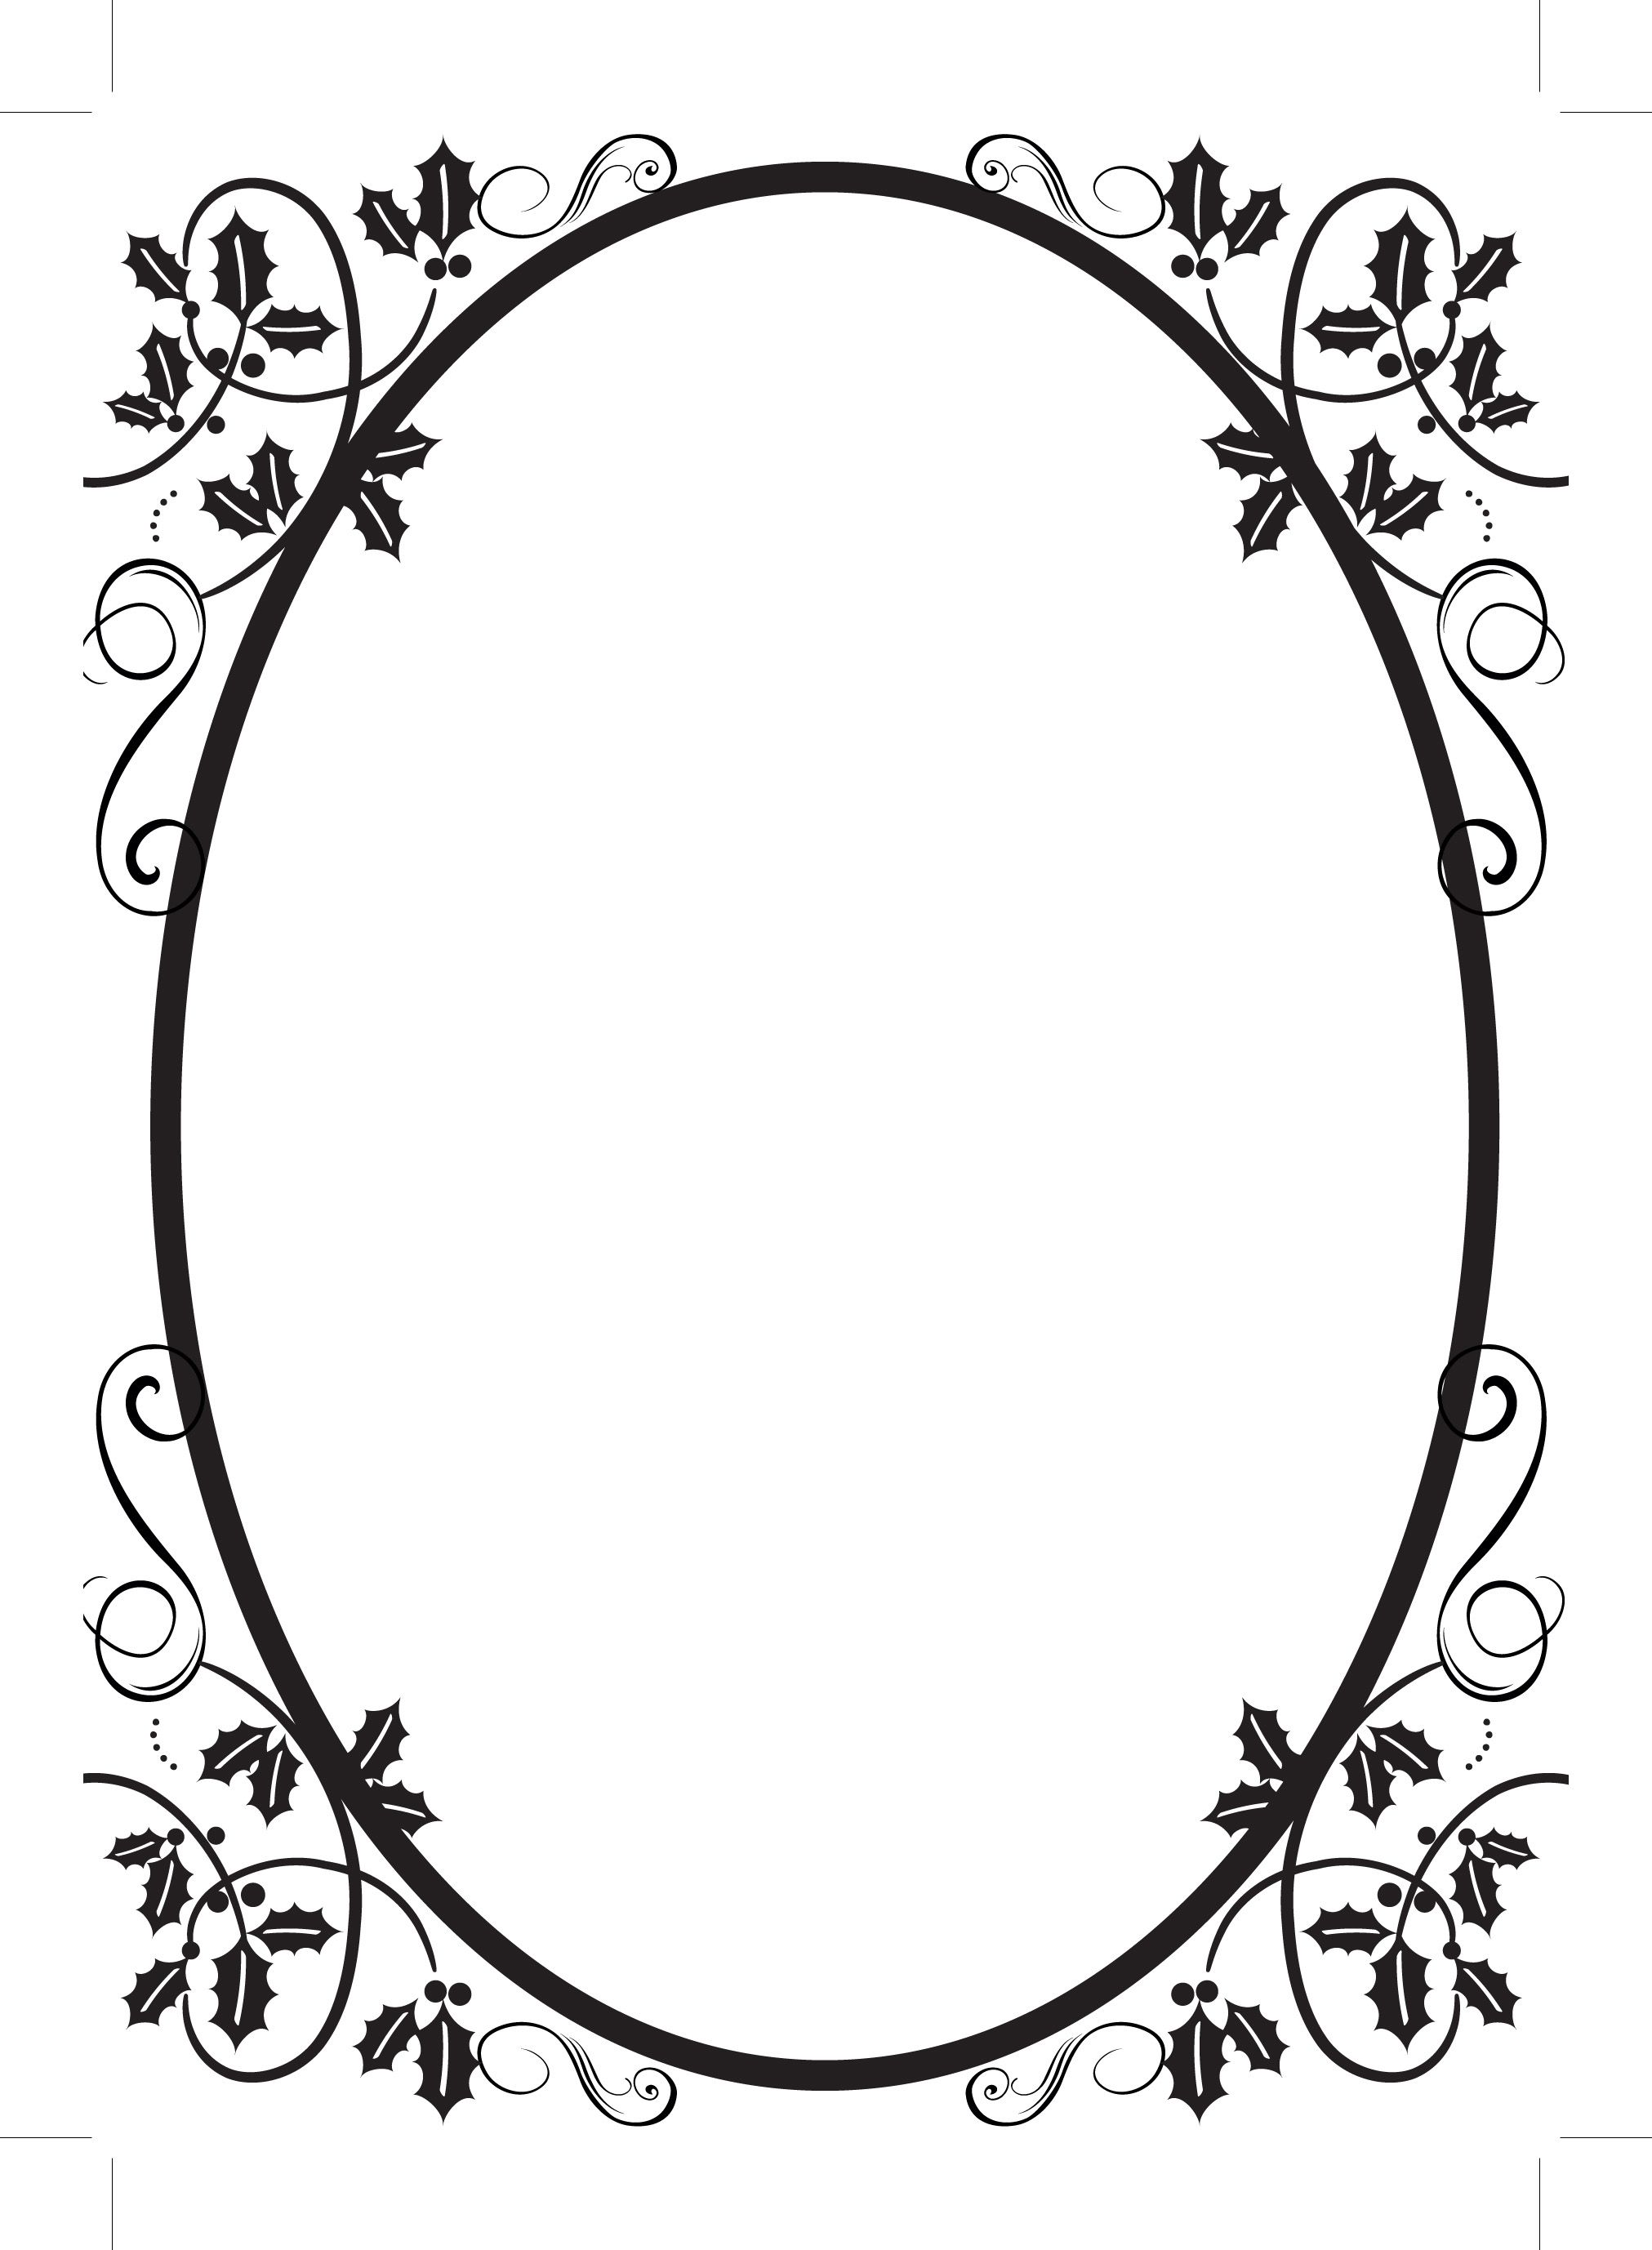 2023x2755 Filigree Border Clipart Best, Oval Scroll Border Clip Art